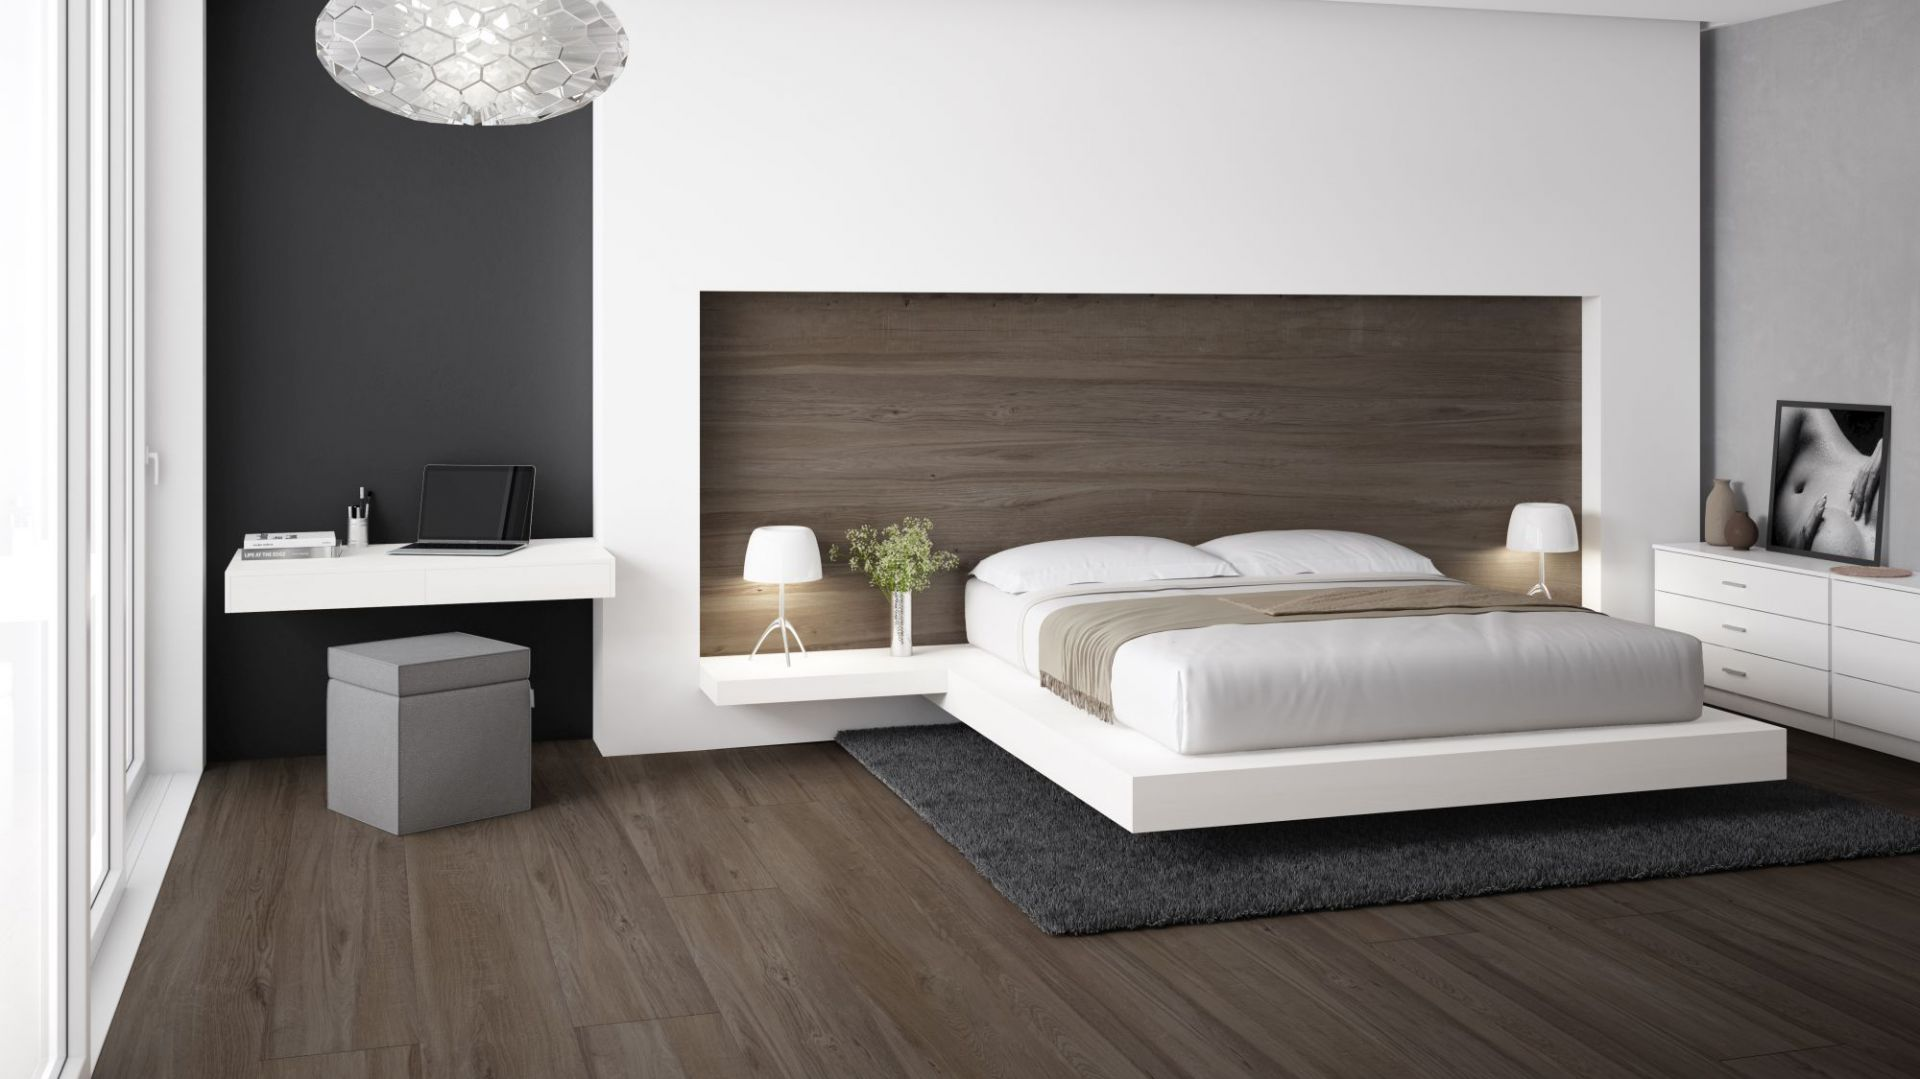 Płytki w sypialni, kolekcja Slabs Junoon brown. Fot. Apavisa